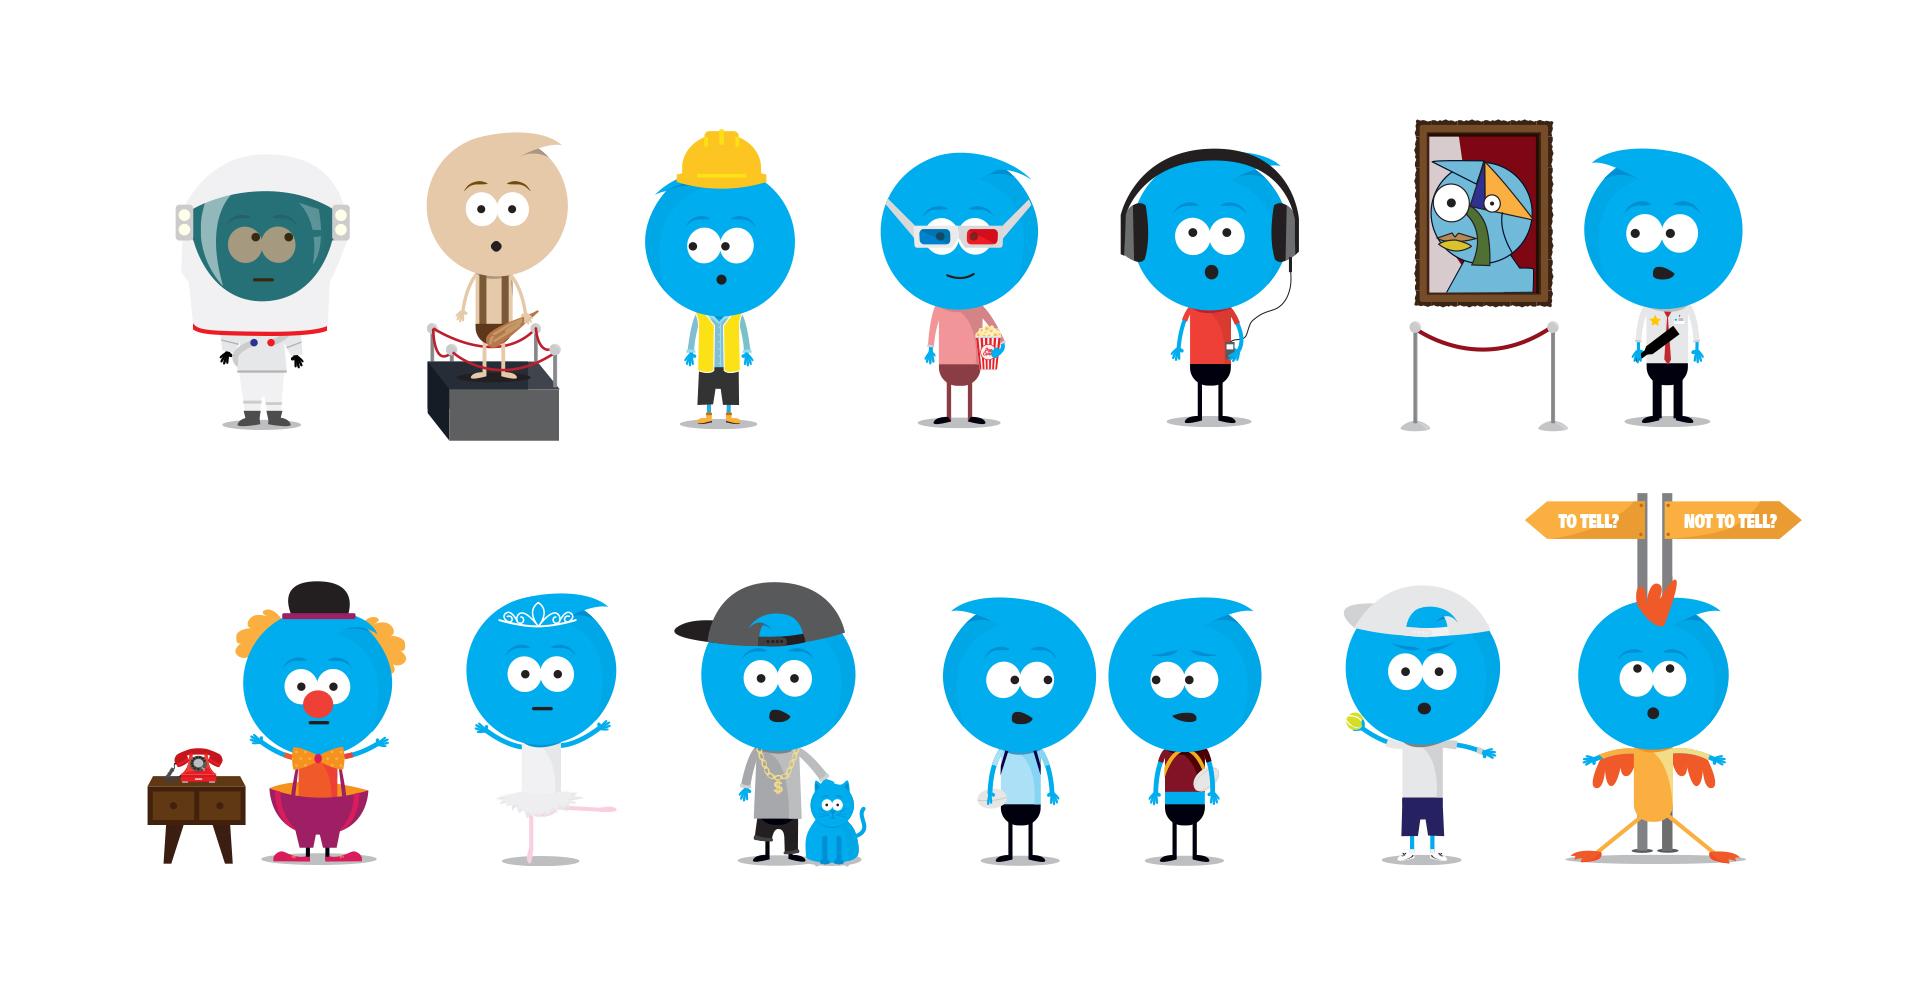 talkward-illustrations.jpg